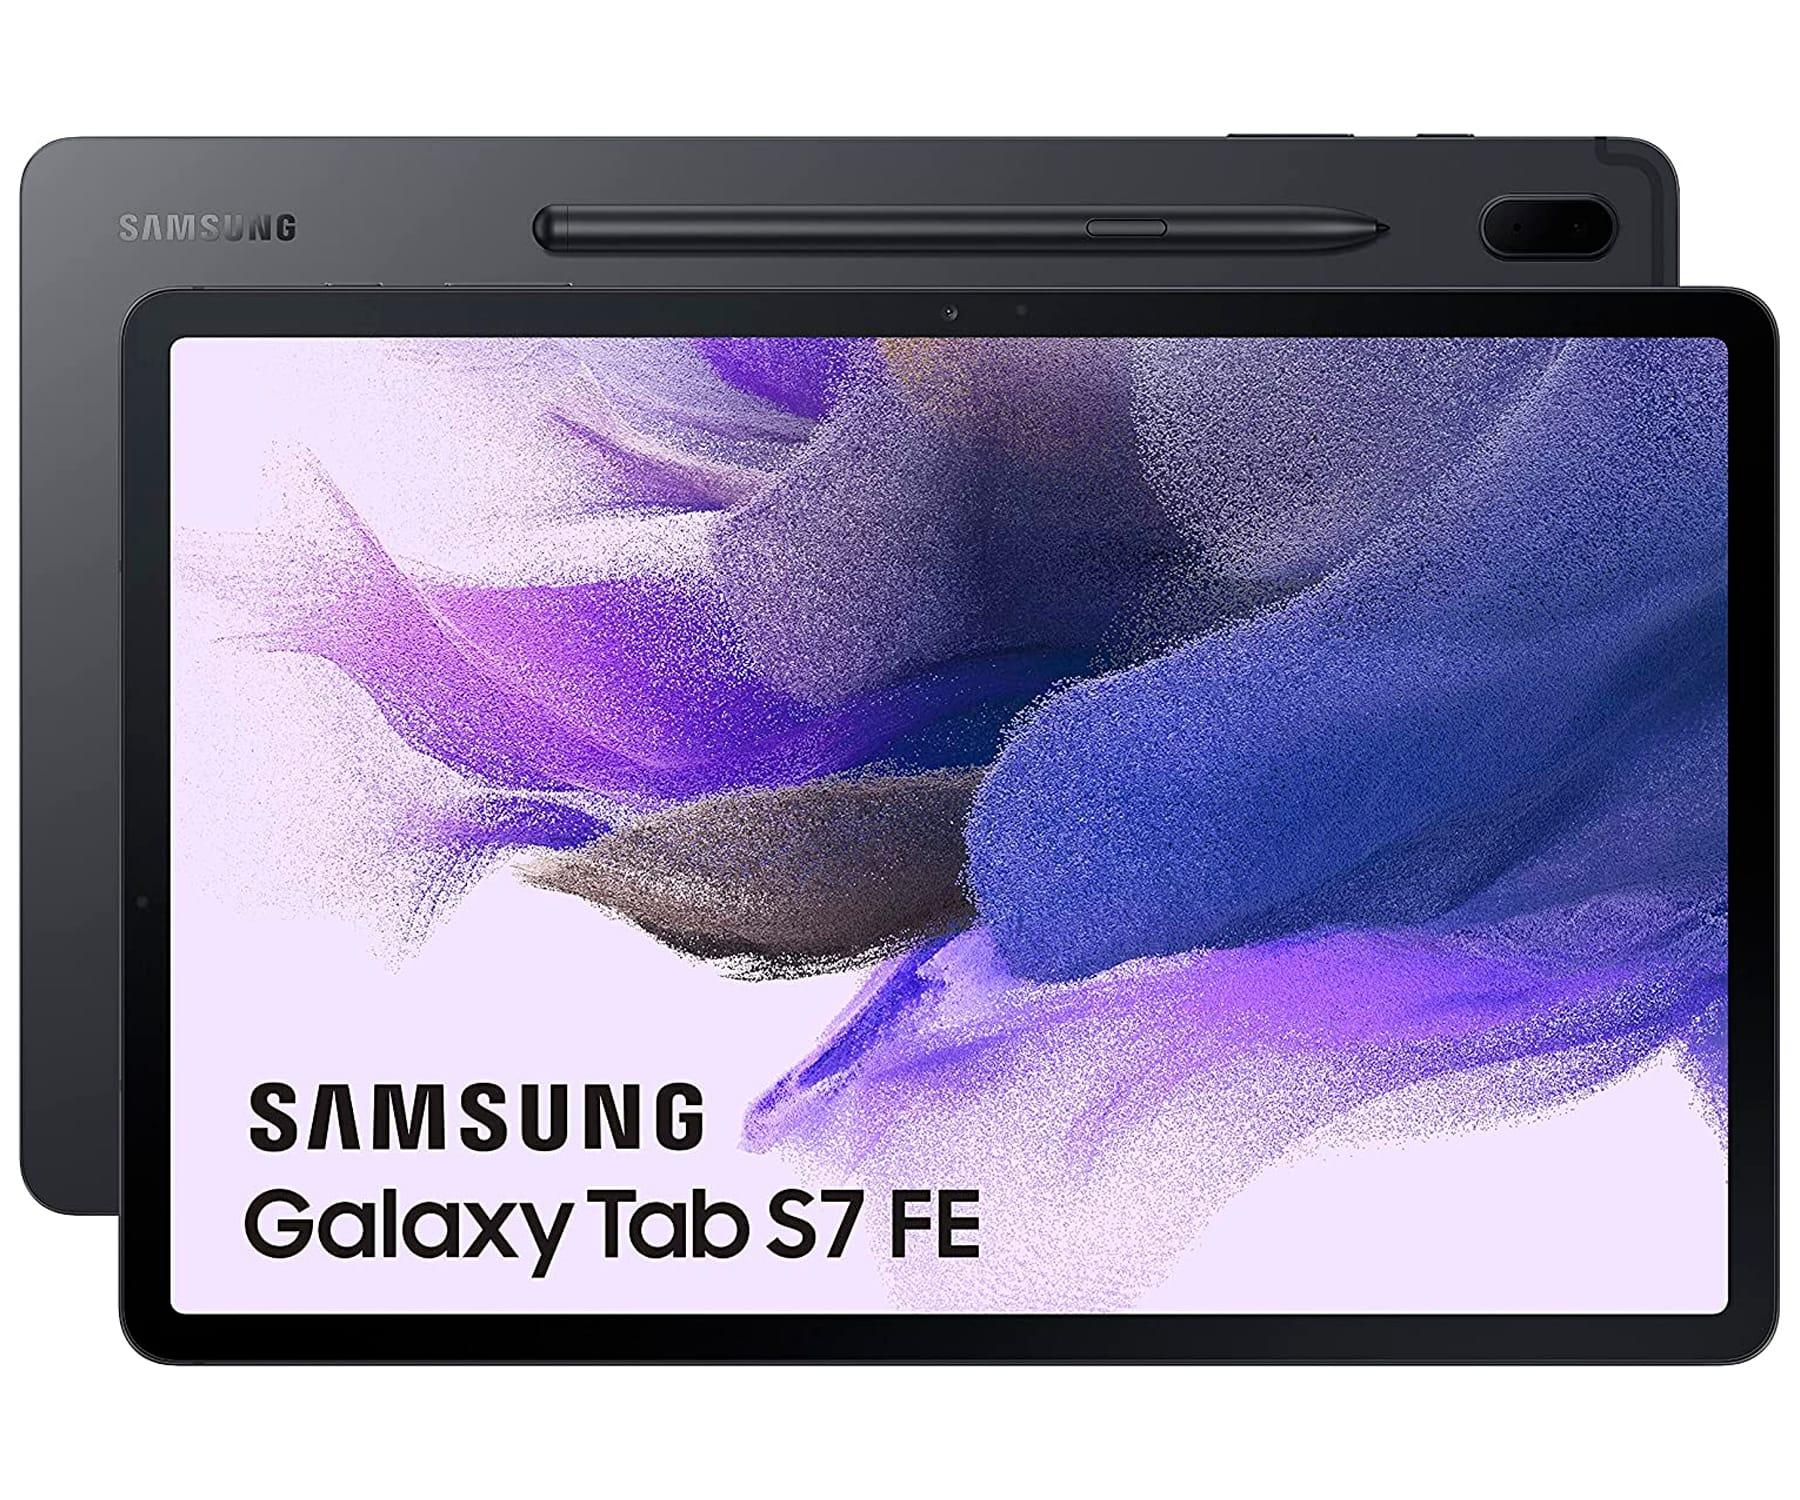 SAMSUNG GALAXY TAB S7 FE 5G NEGRO (MYSTIC BLACK) 4+64GB / 12.4'' / S PEN